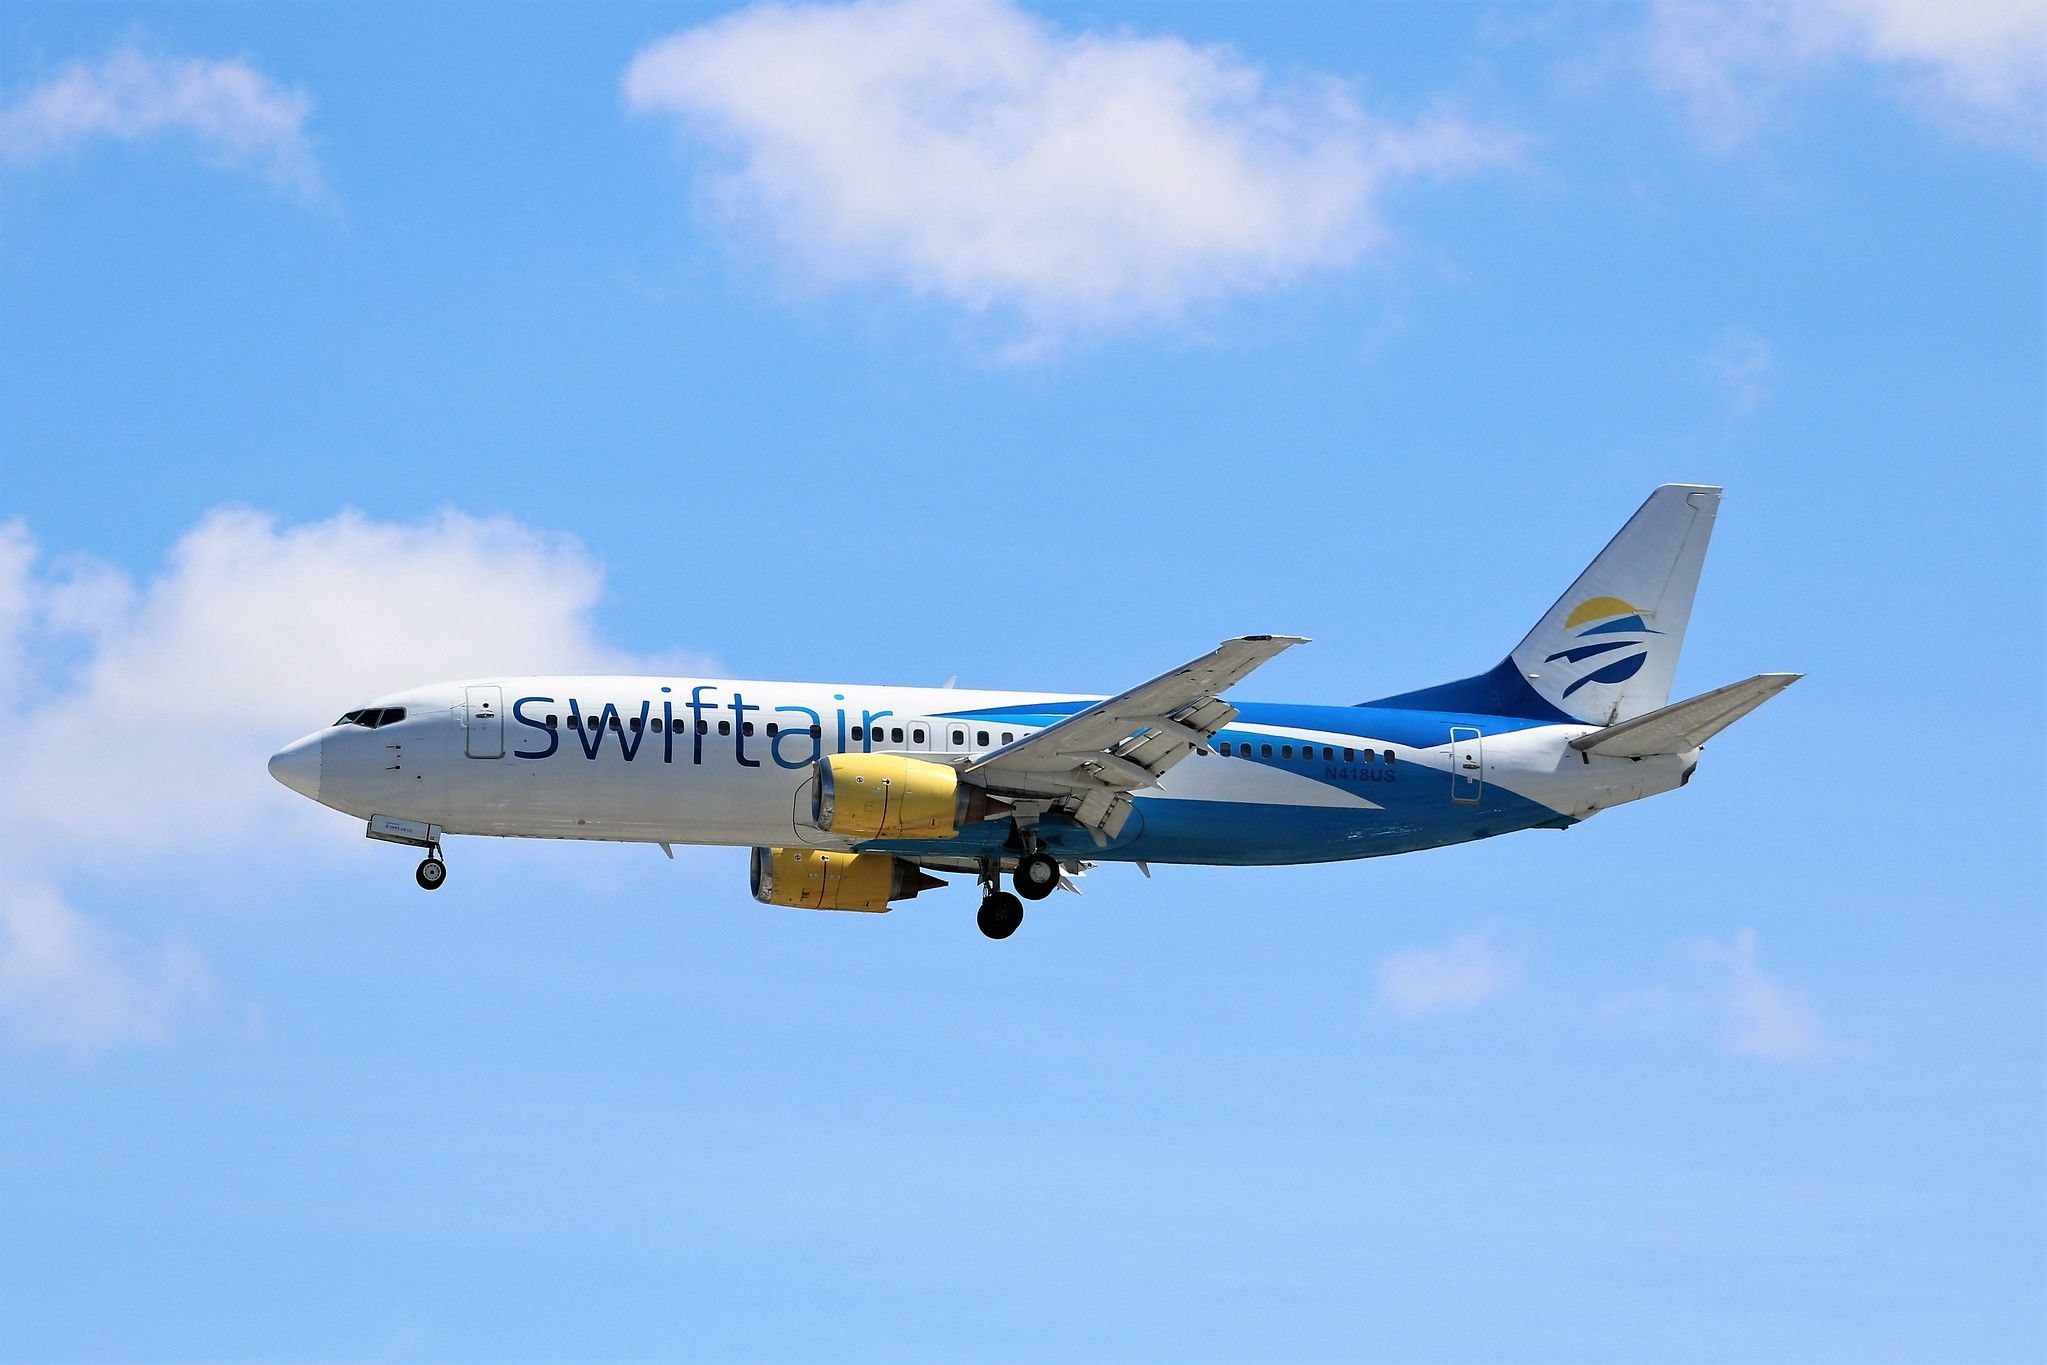 Swift Air 737 Piedmont airlines, Air, Boeing 737